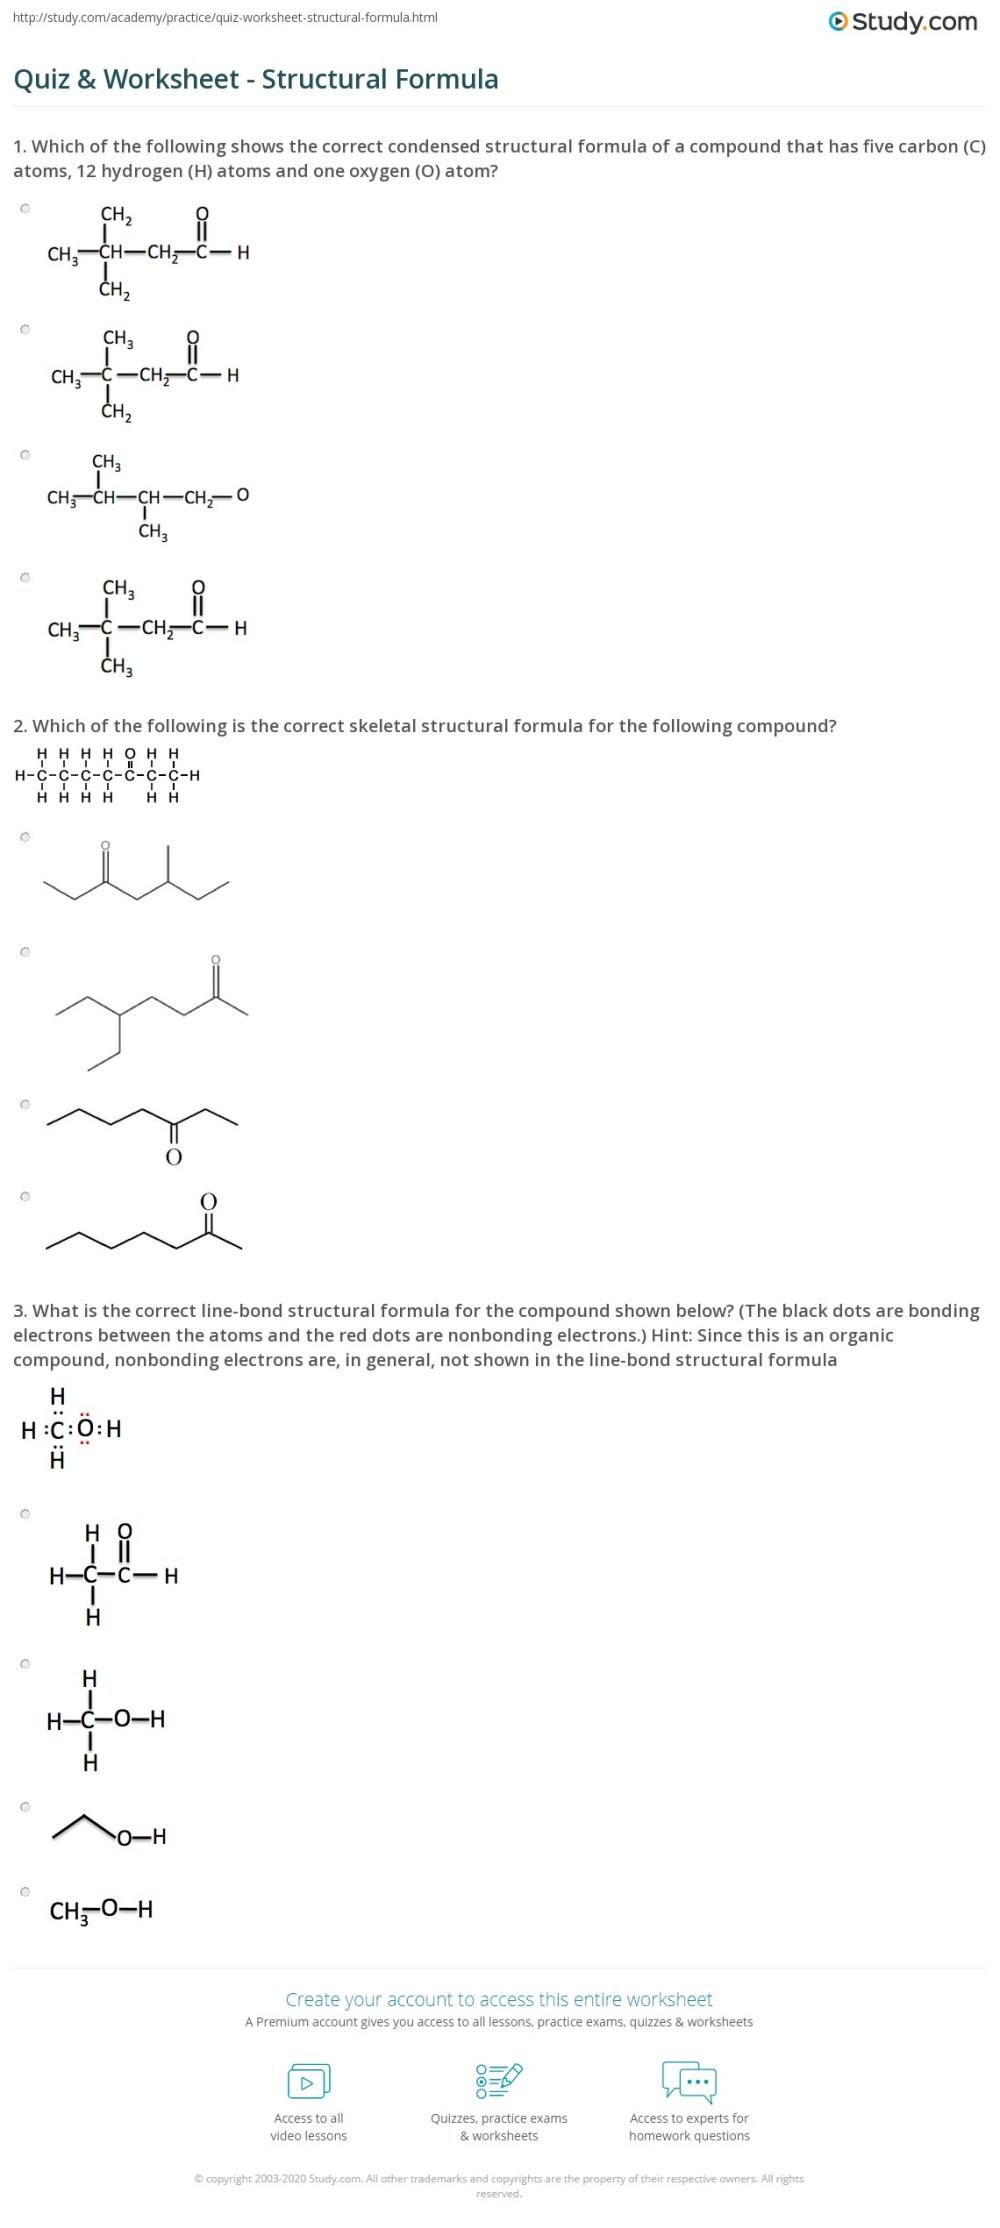 medium resolution of Quiz \u0026 Worksheet - Structural Formula   Study.com